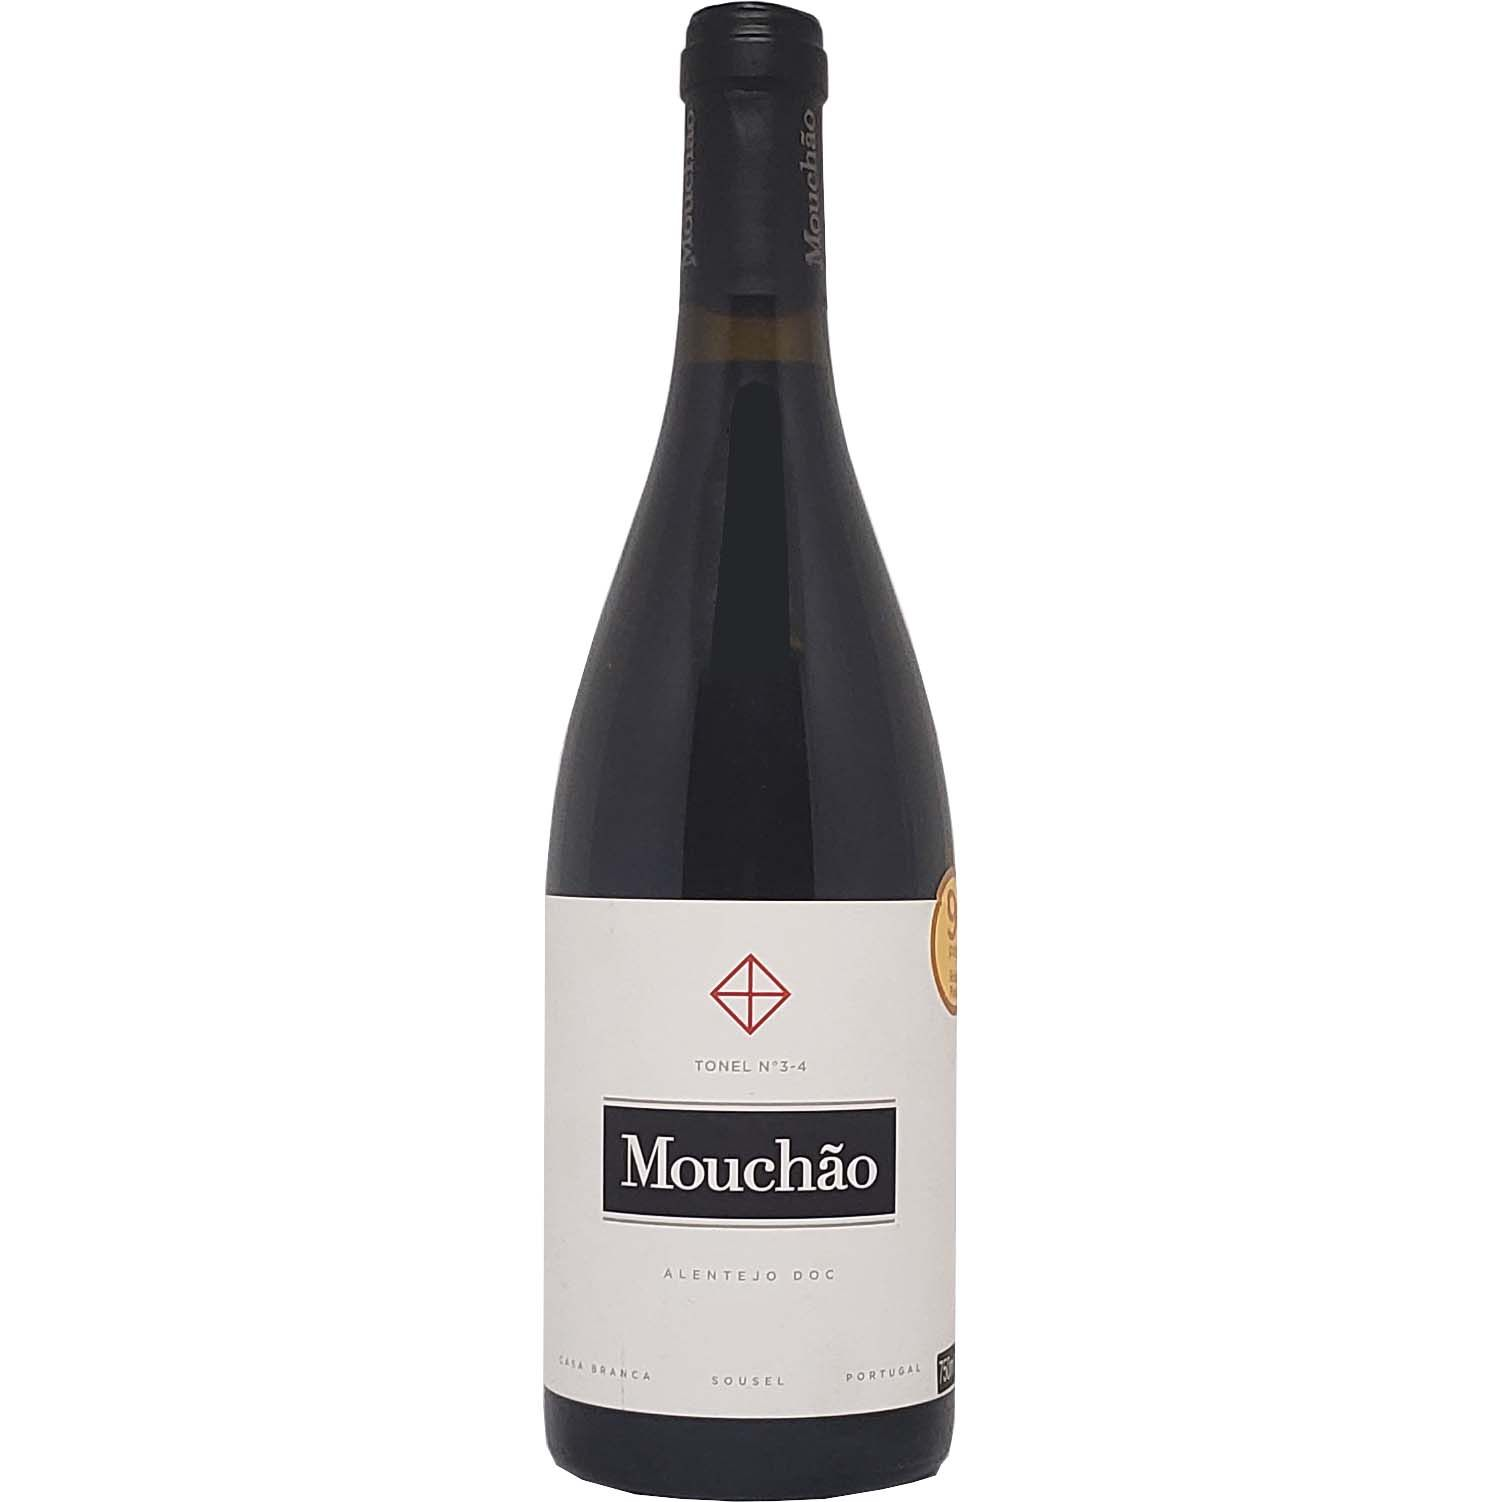 Vinho Tinto Mouchão Tonel 3-4 - 750ml -